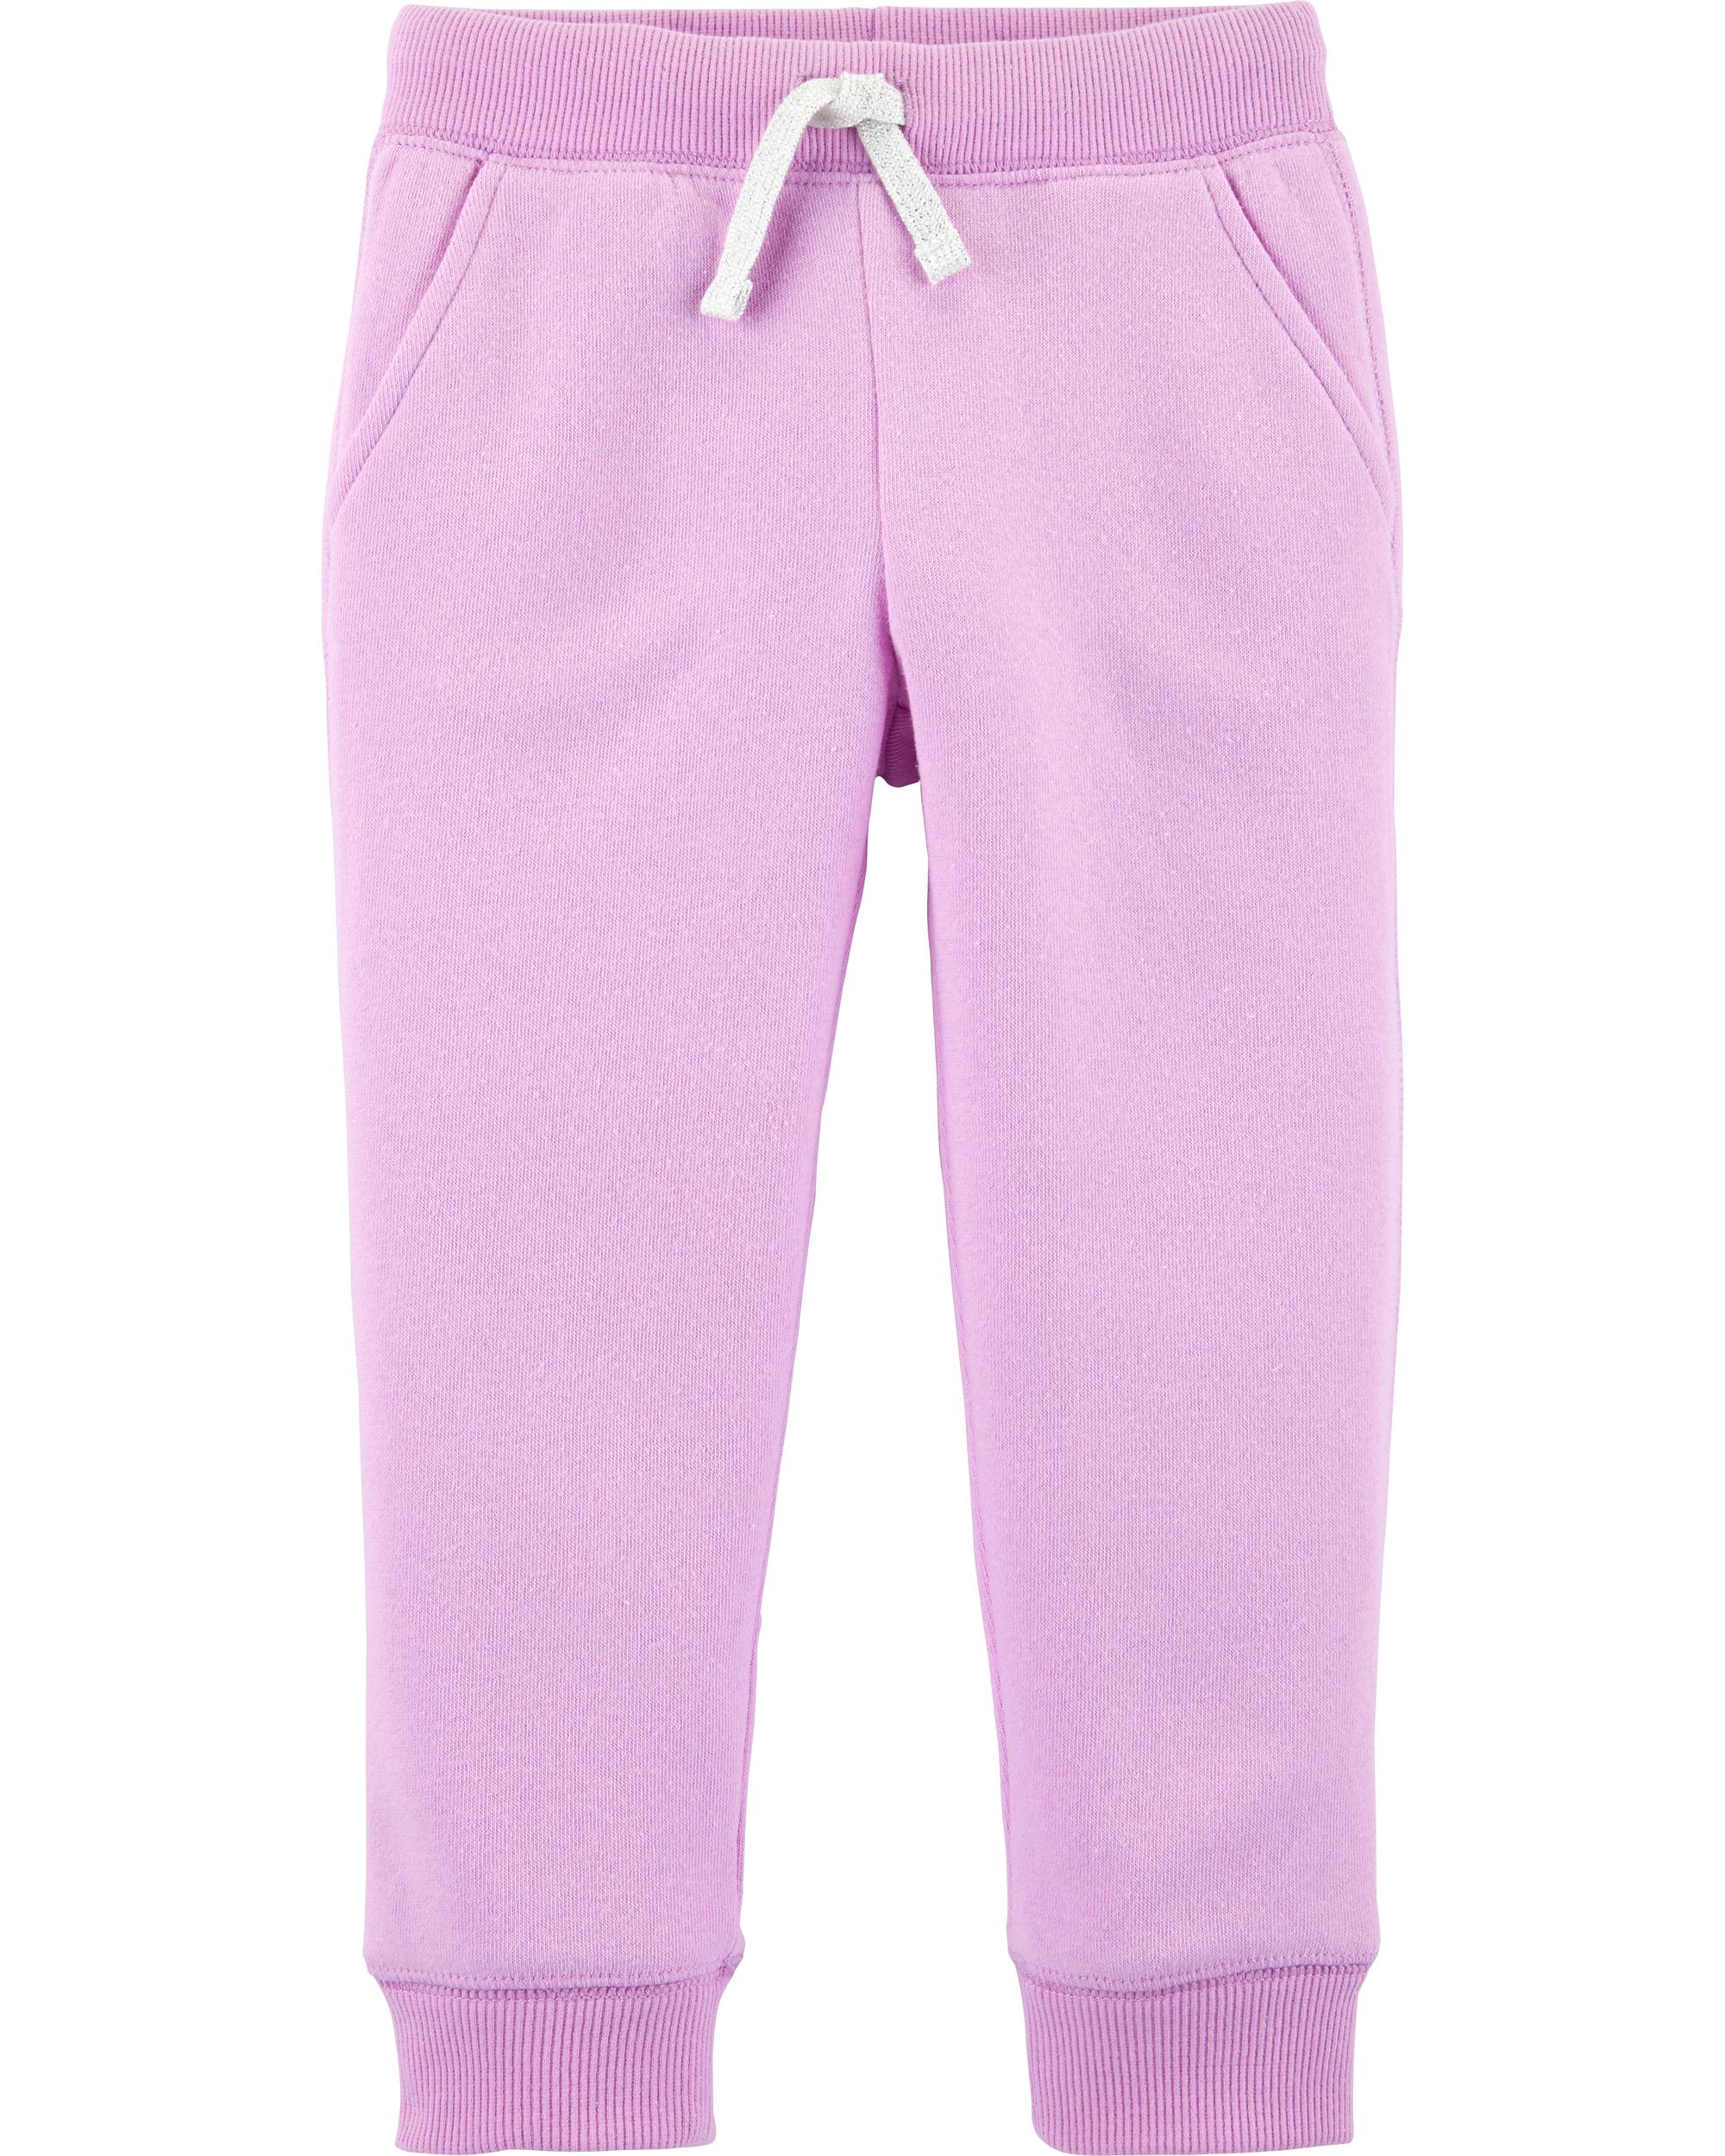 מכנס ארוך סגול